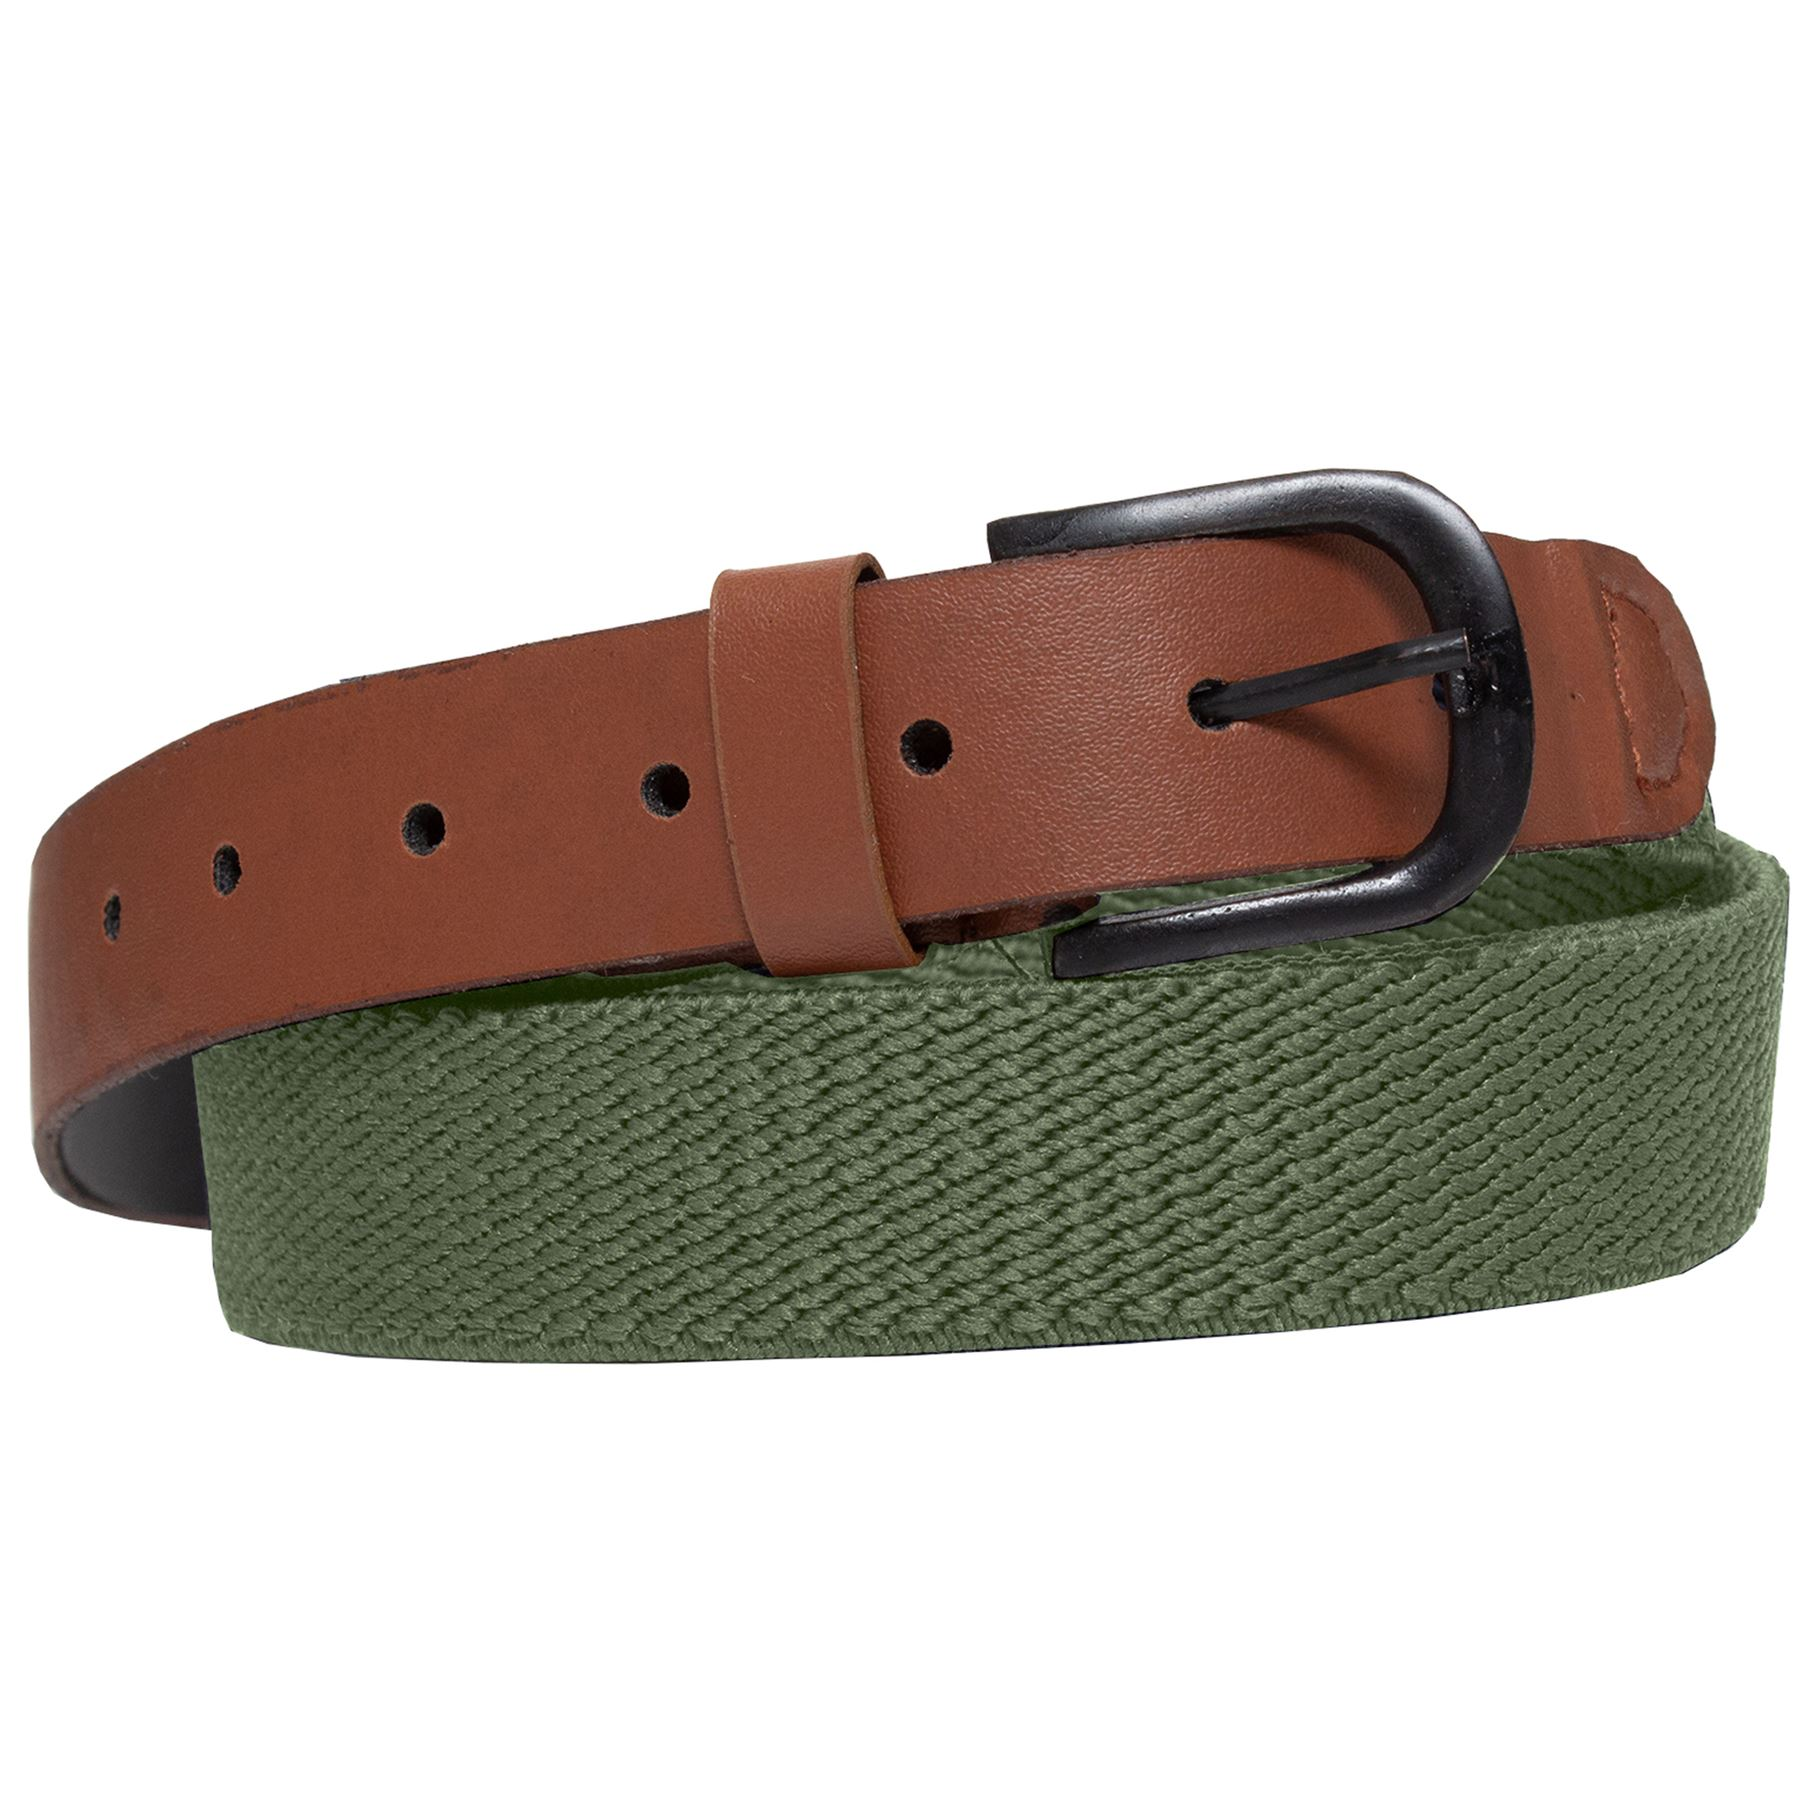 ENZO-Mens-Womens-Elasticated-Belts-Canvas-Stretch-PU-Leather-Trim-Braided-Belt Indexbild 14